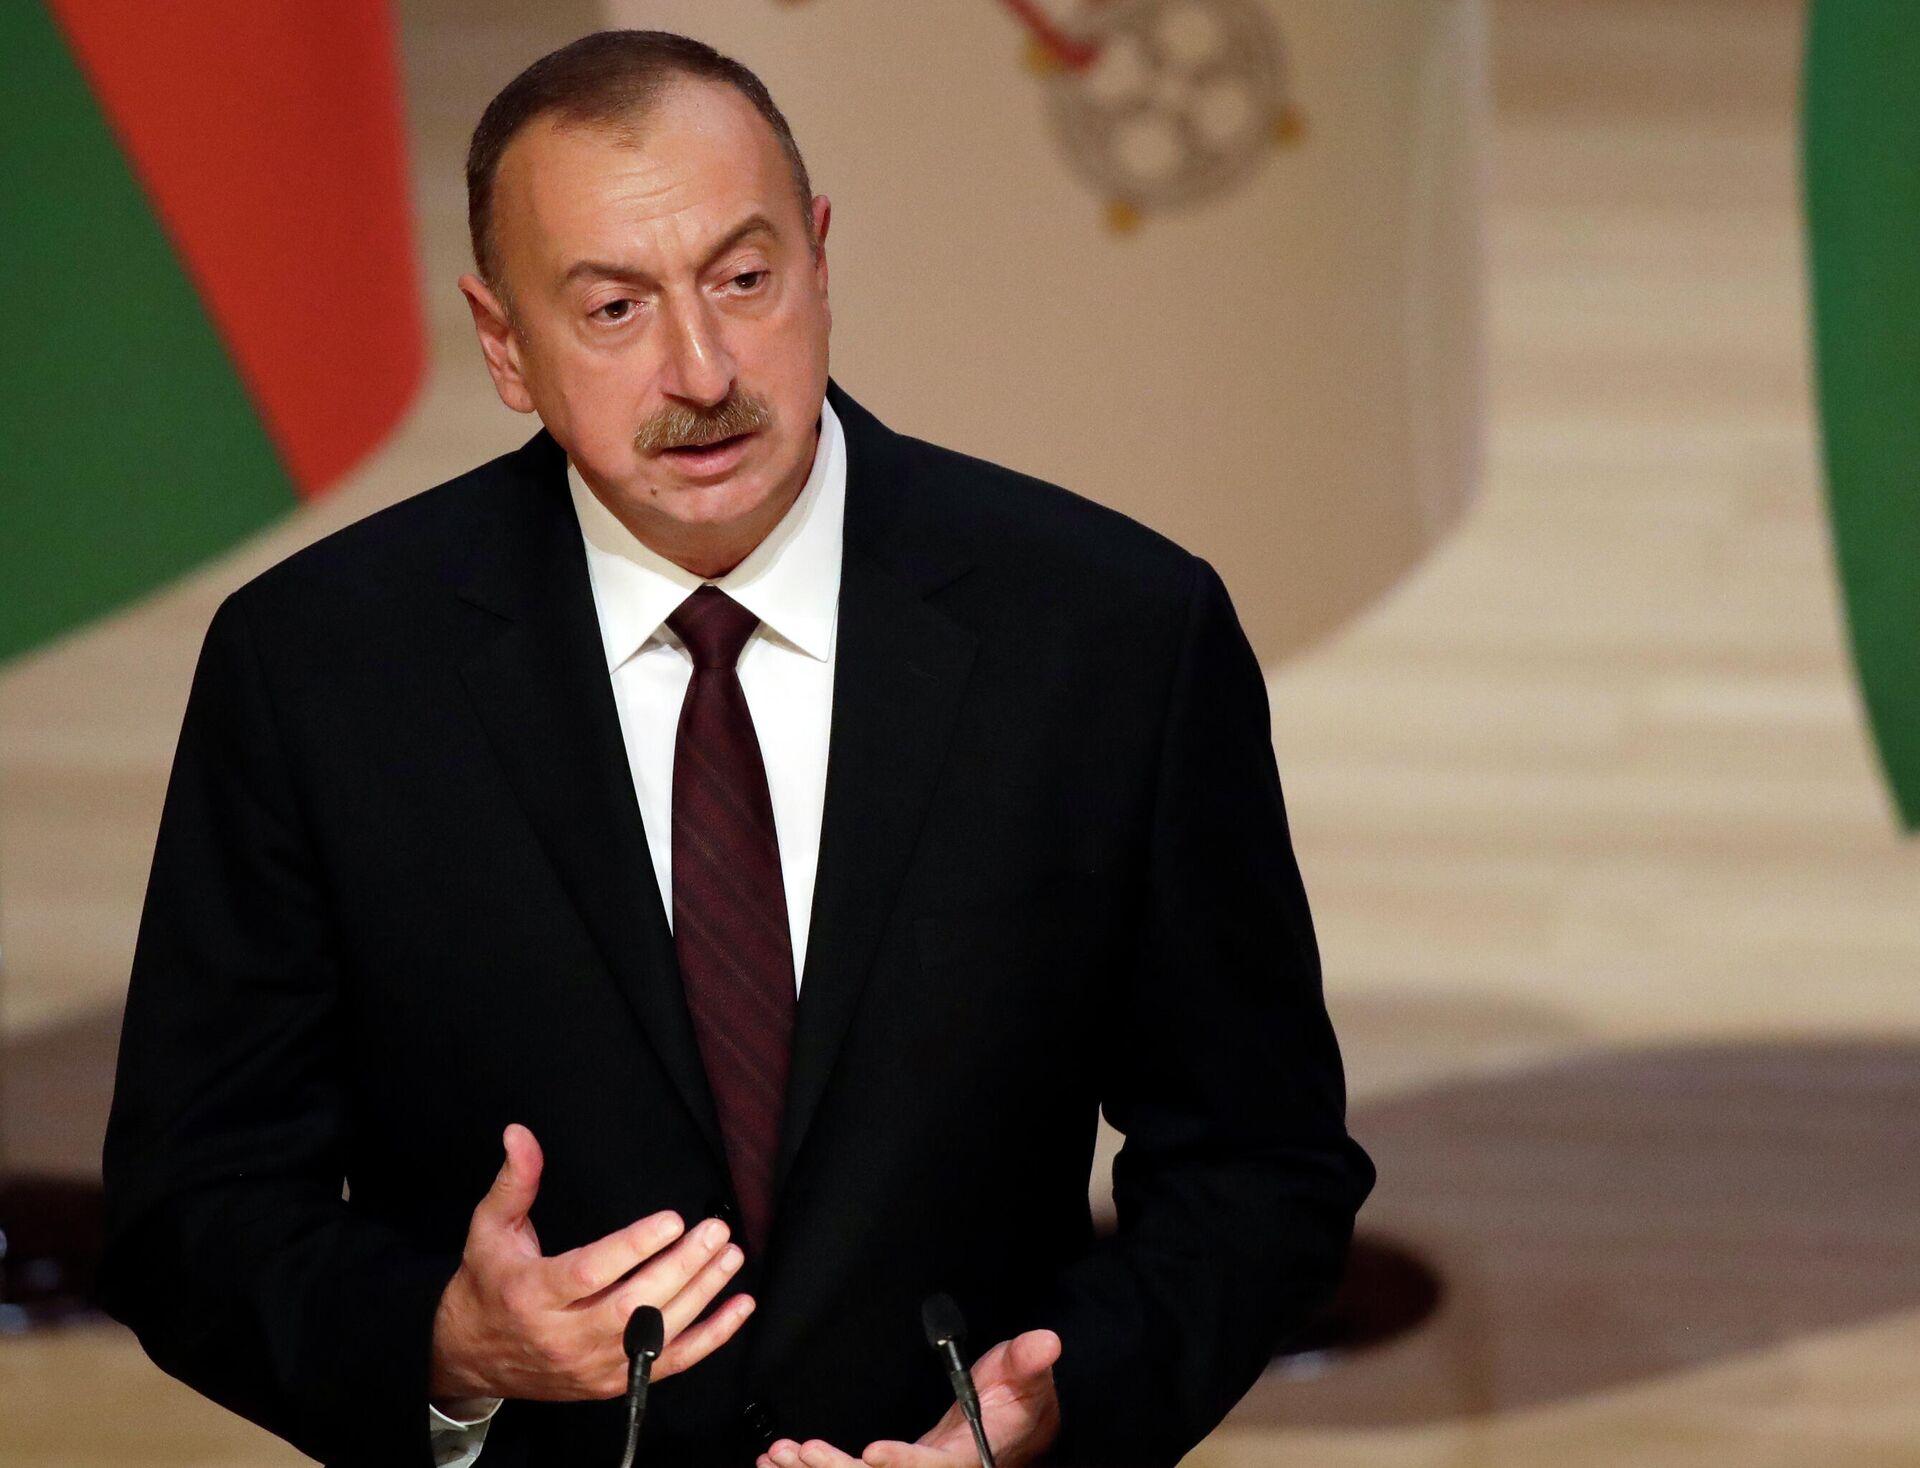 Президент Азербайджана Ильхам Алиев - РИА Новости, 1920, 15.10.2020